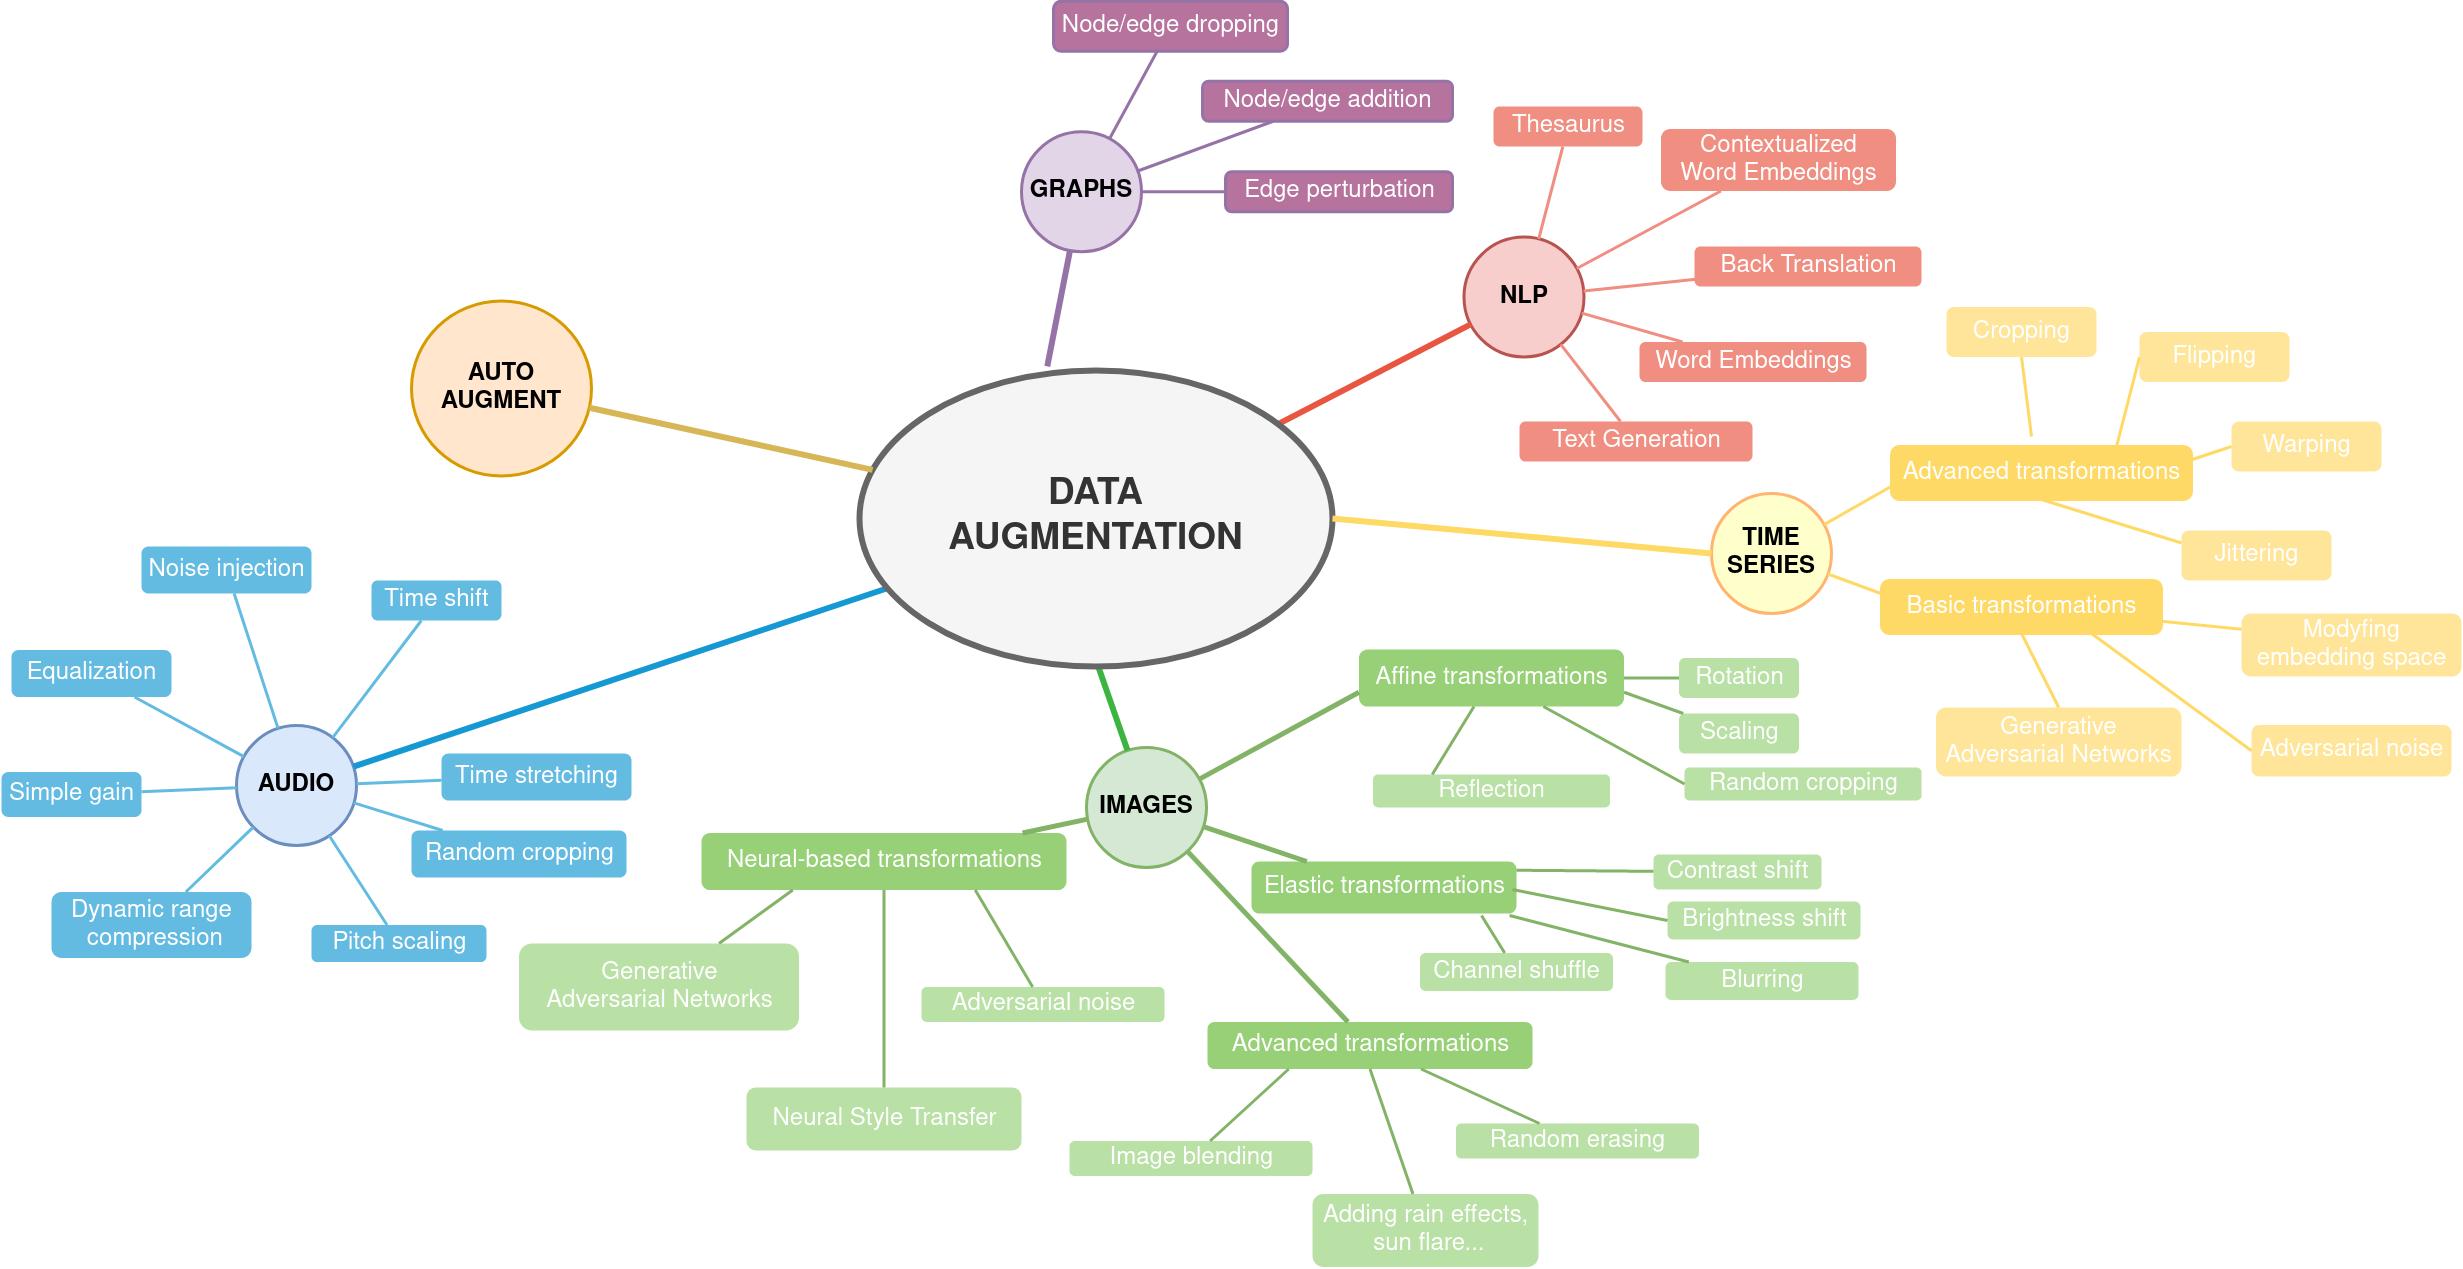 data augmentation diagram